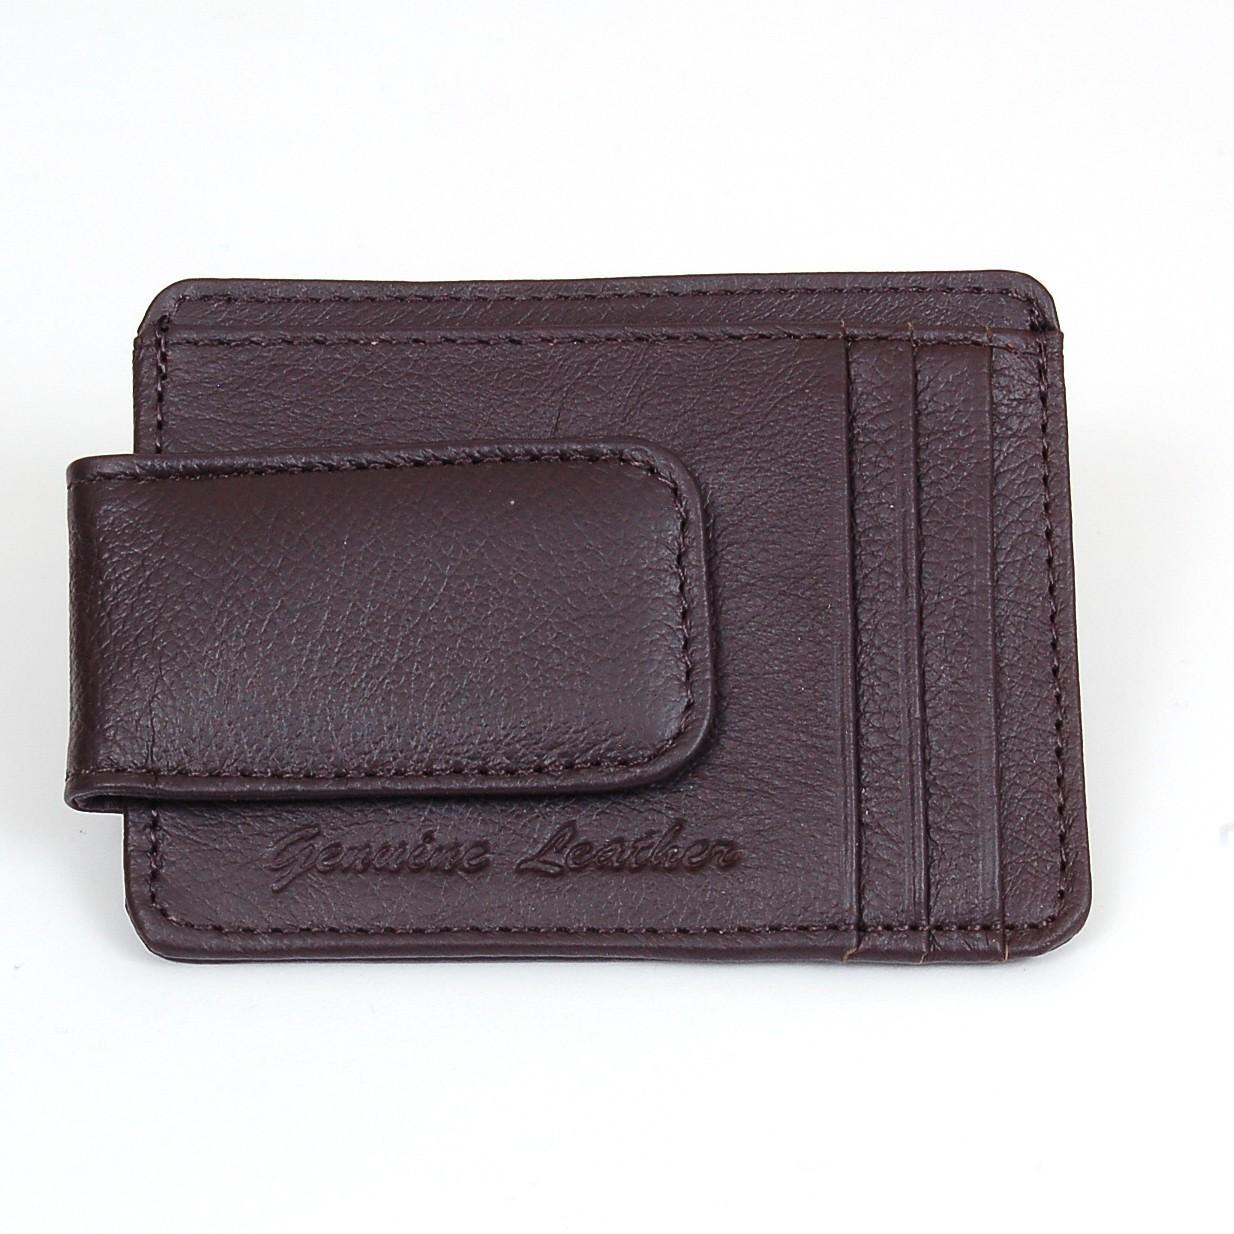 Mens Leather Wallet Money Clip Credit Card ID Holder Front Pocket Thin Slim NEW | eBay